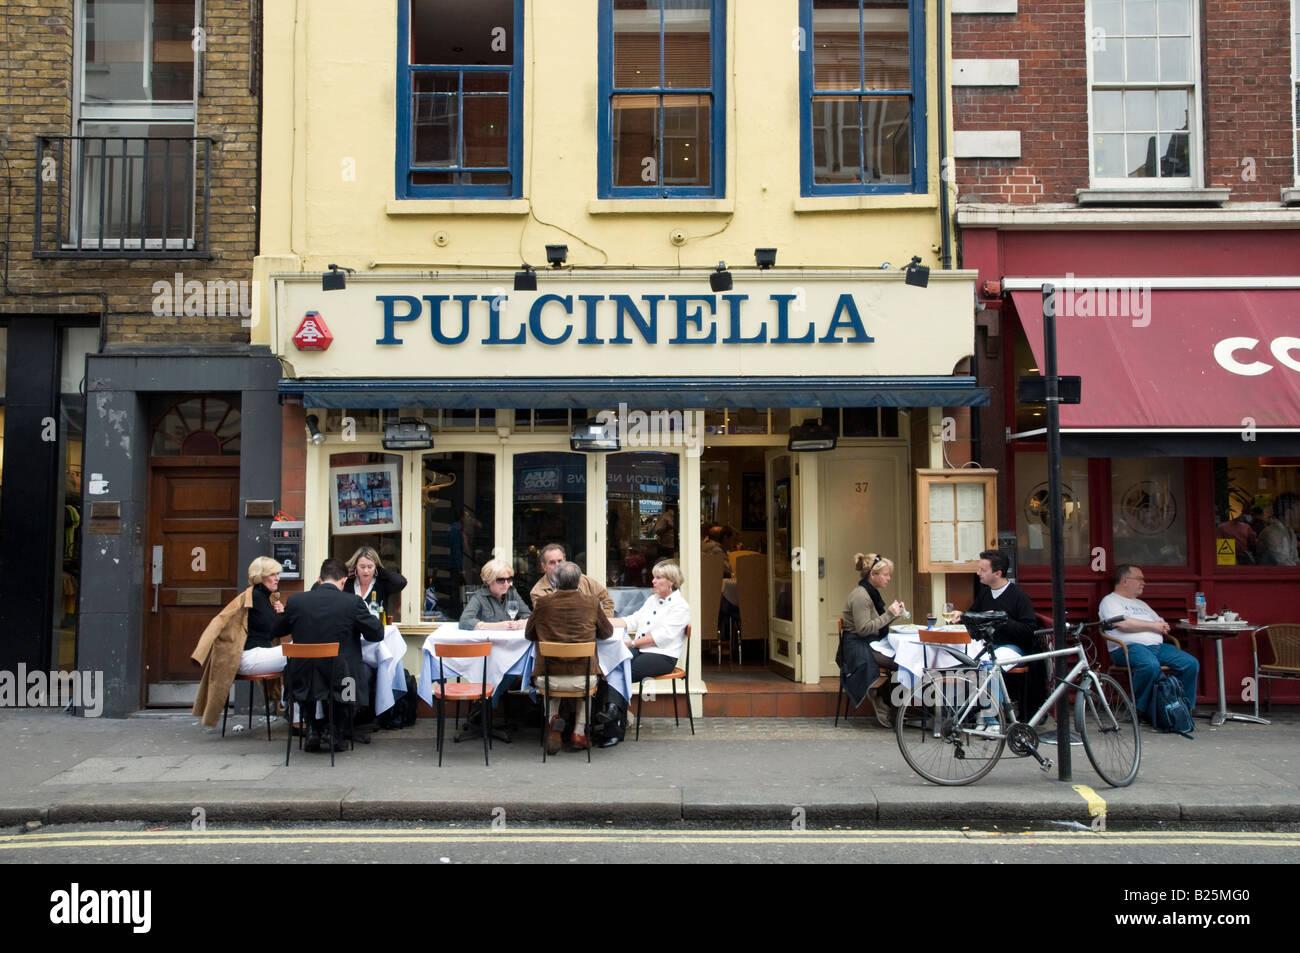 Pulcinella cafe in Old Compton Street, Soho, London, England, UK - Stock Image